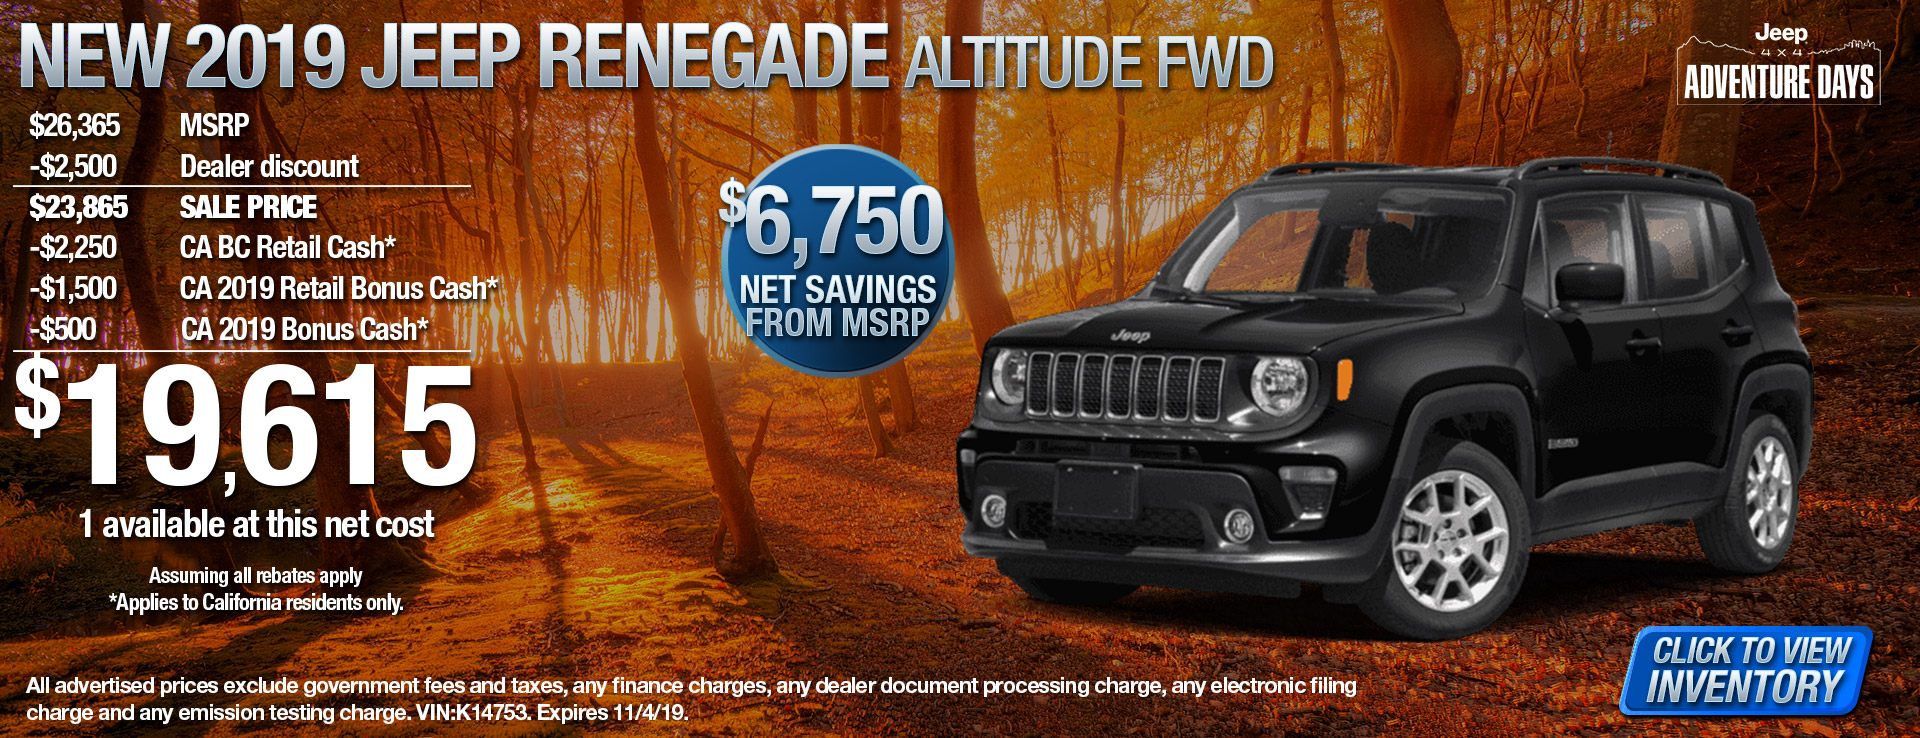 19 Jeep Renegade